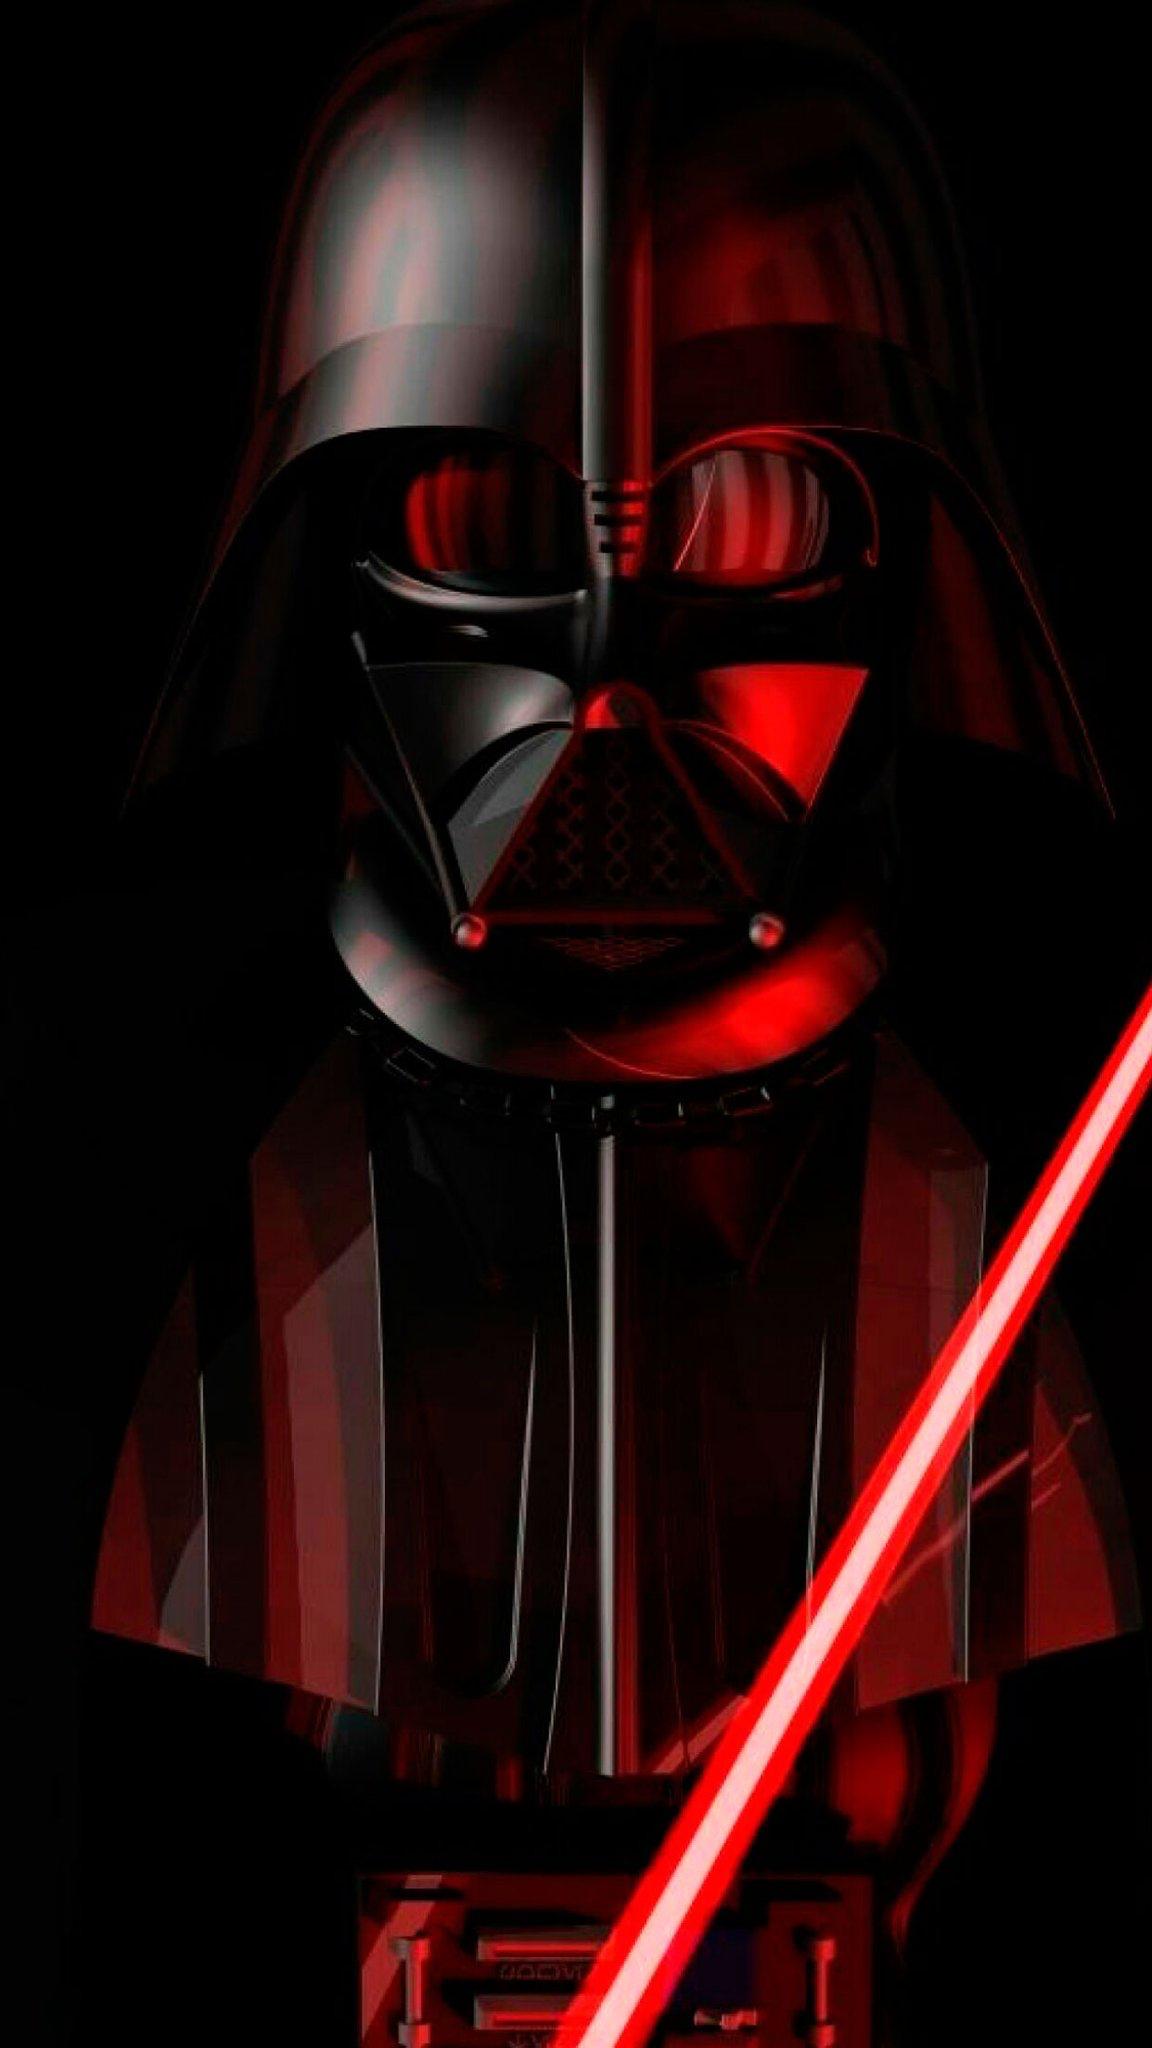 Pin by Nostalgia21 on Star Wars Star wars wallpaper